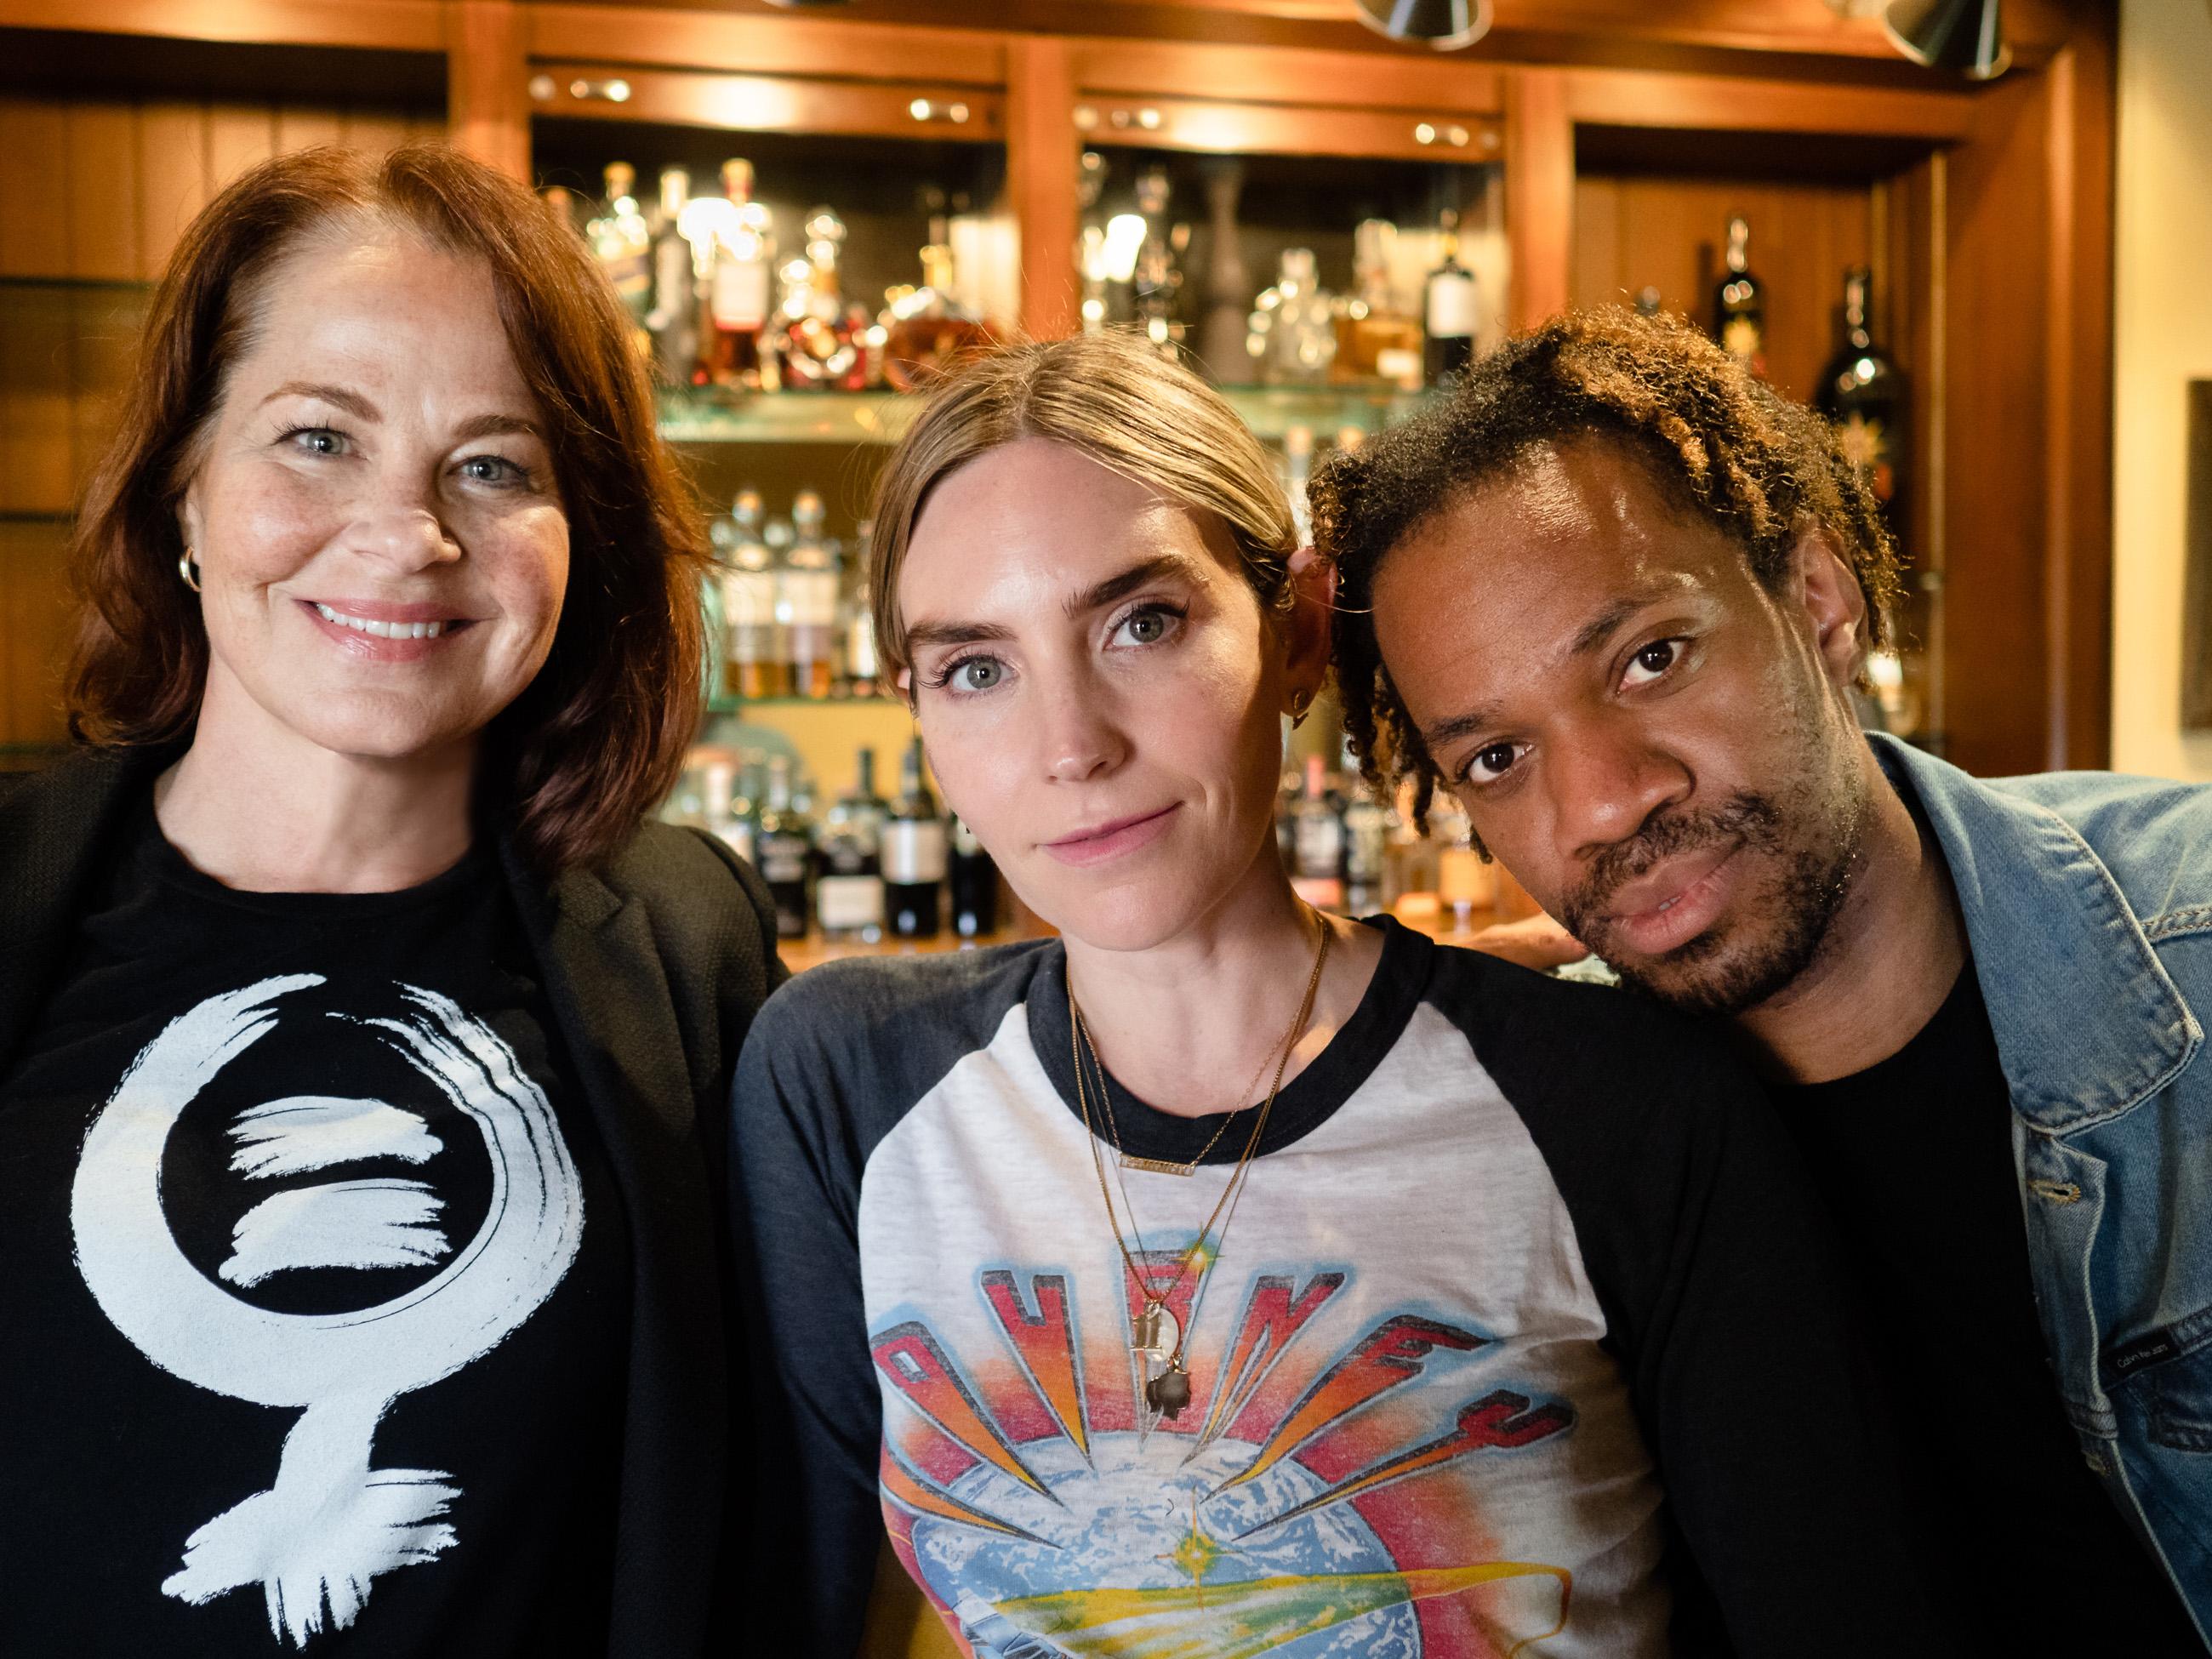 Deirdre Lovejoy, Aleque Reid, Reggie D. White of THE LUCKIEST. Photo by Jim Carmody.